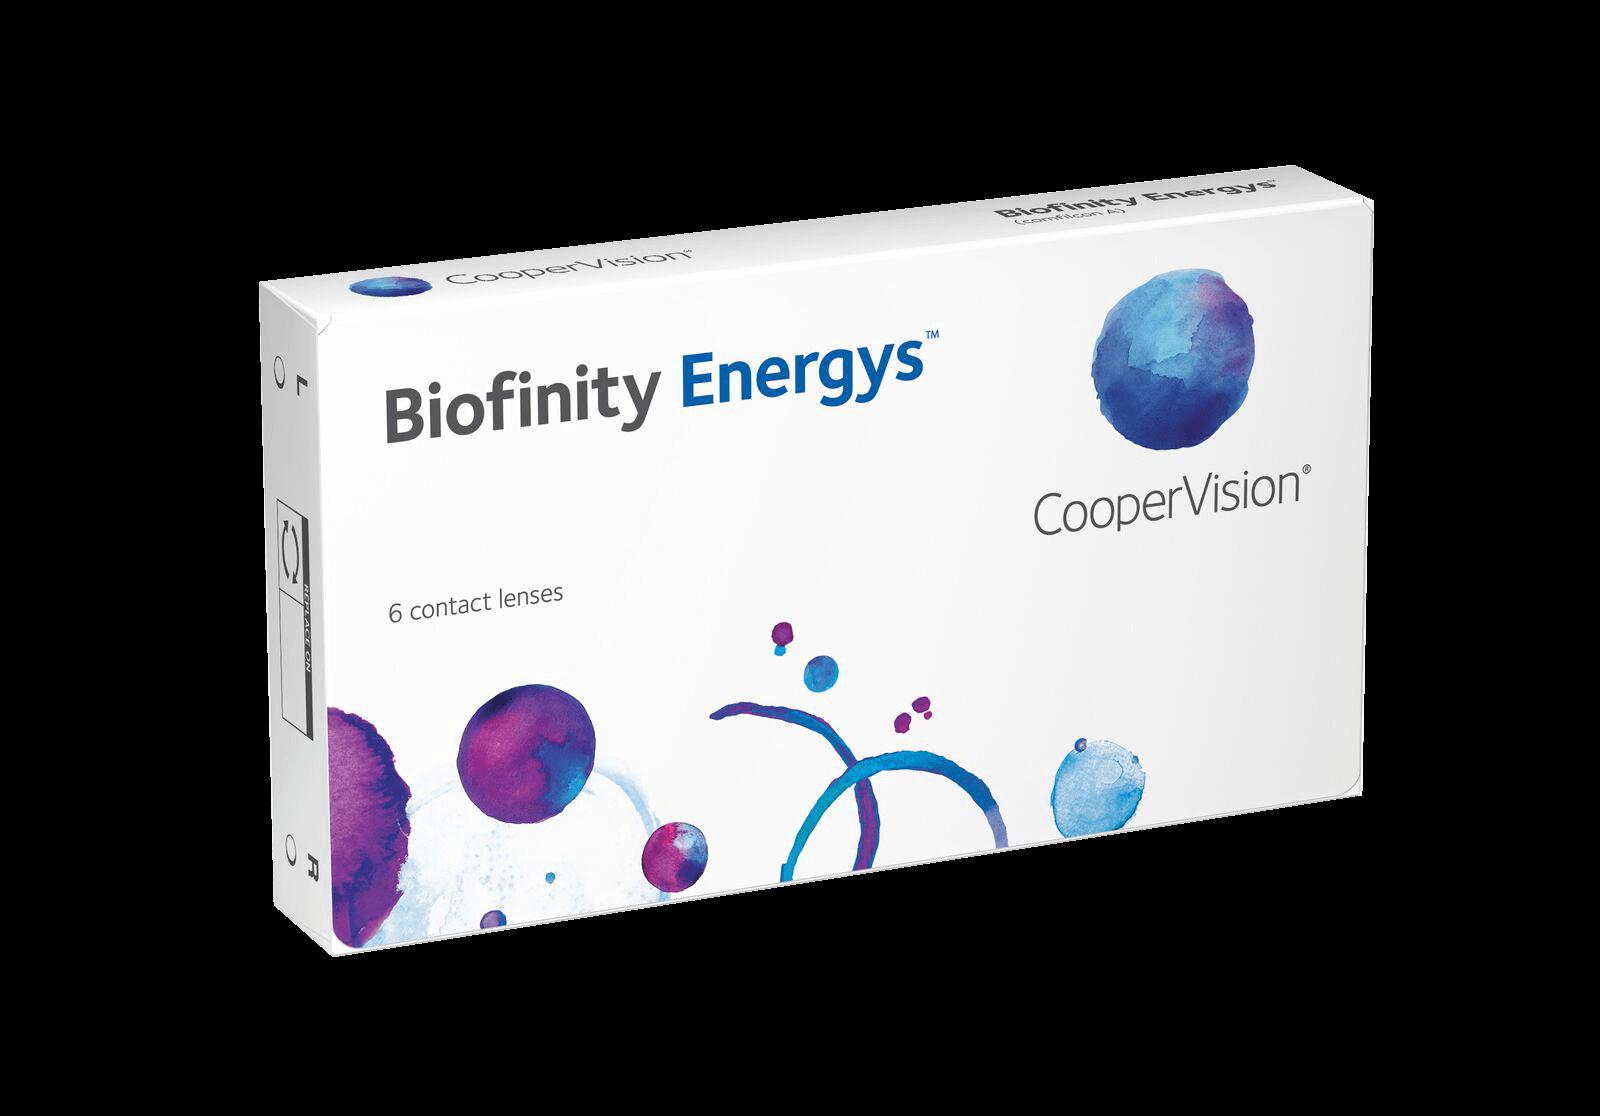 cf1ed2a9423ac Biofinity